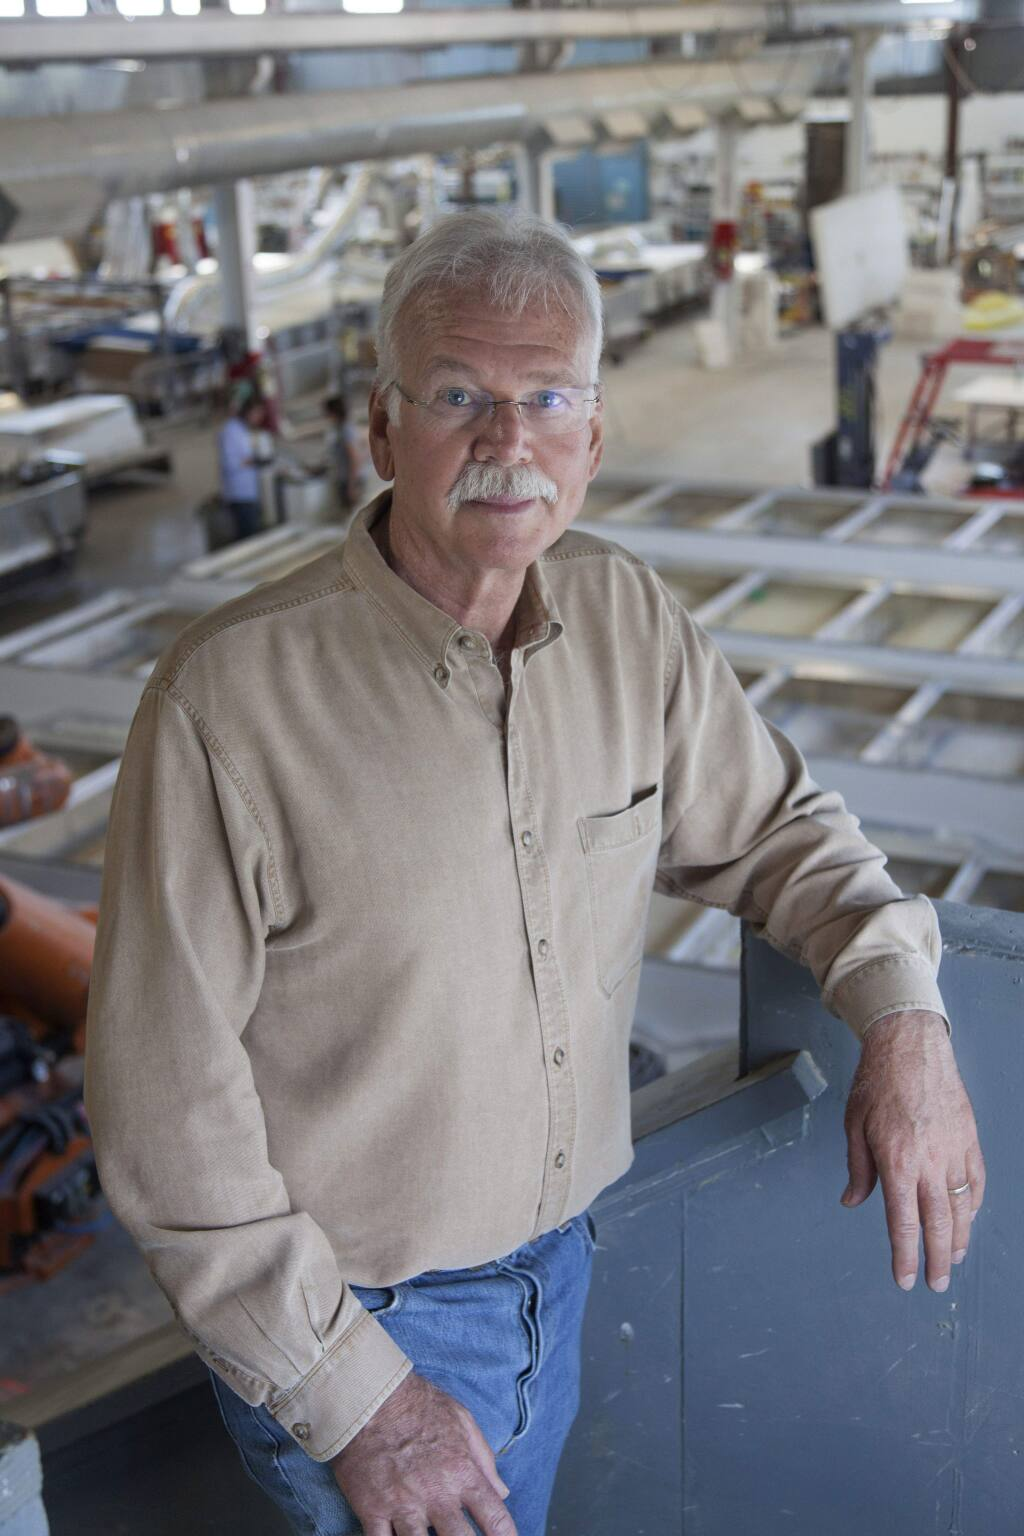 William Kreysler, founder and president of American Canyon-based Kryesler & Associates